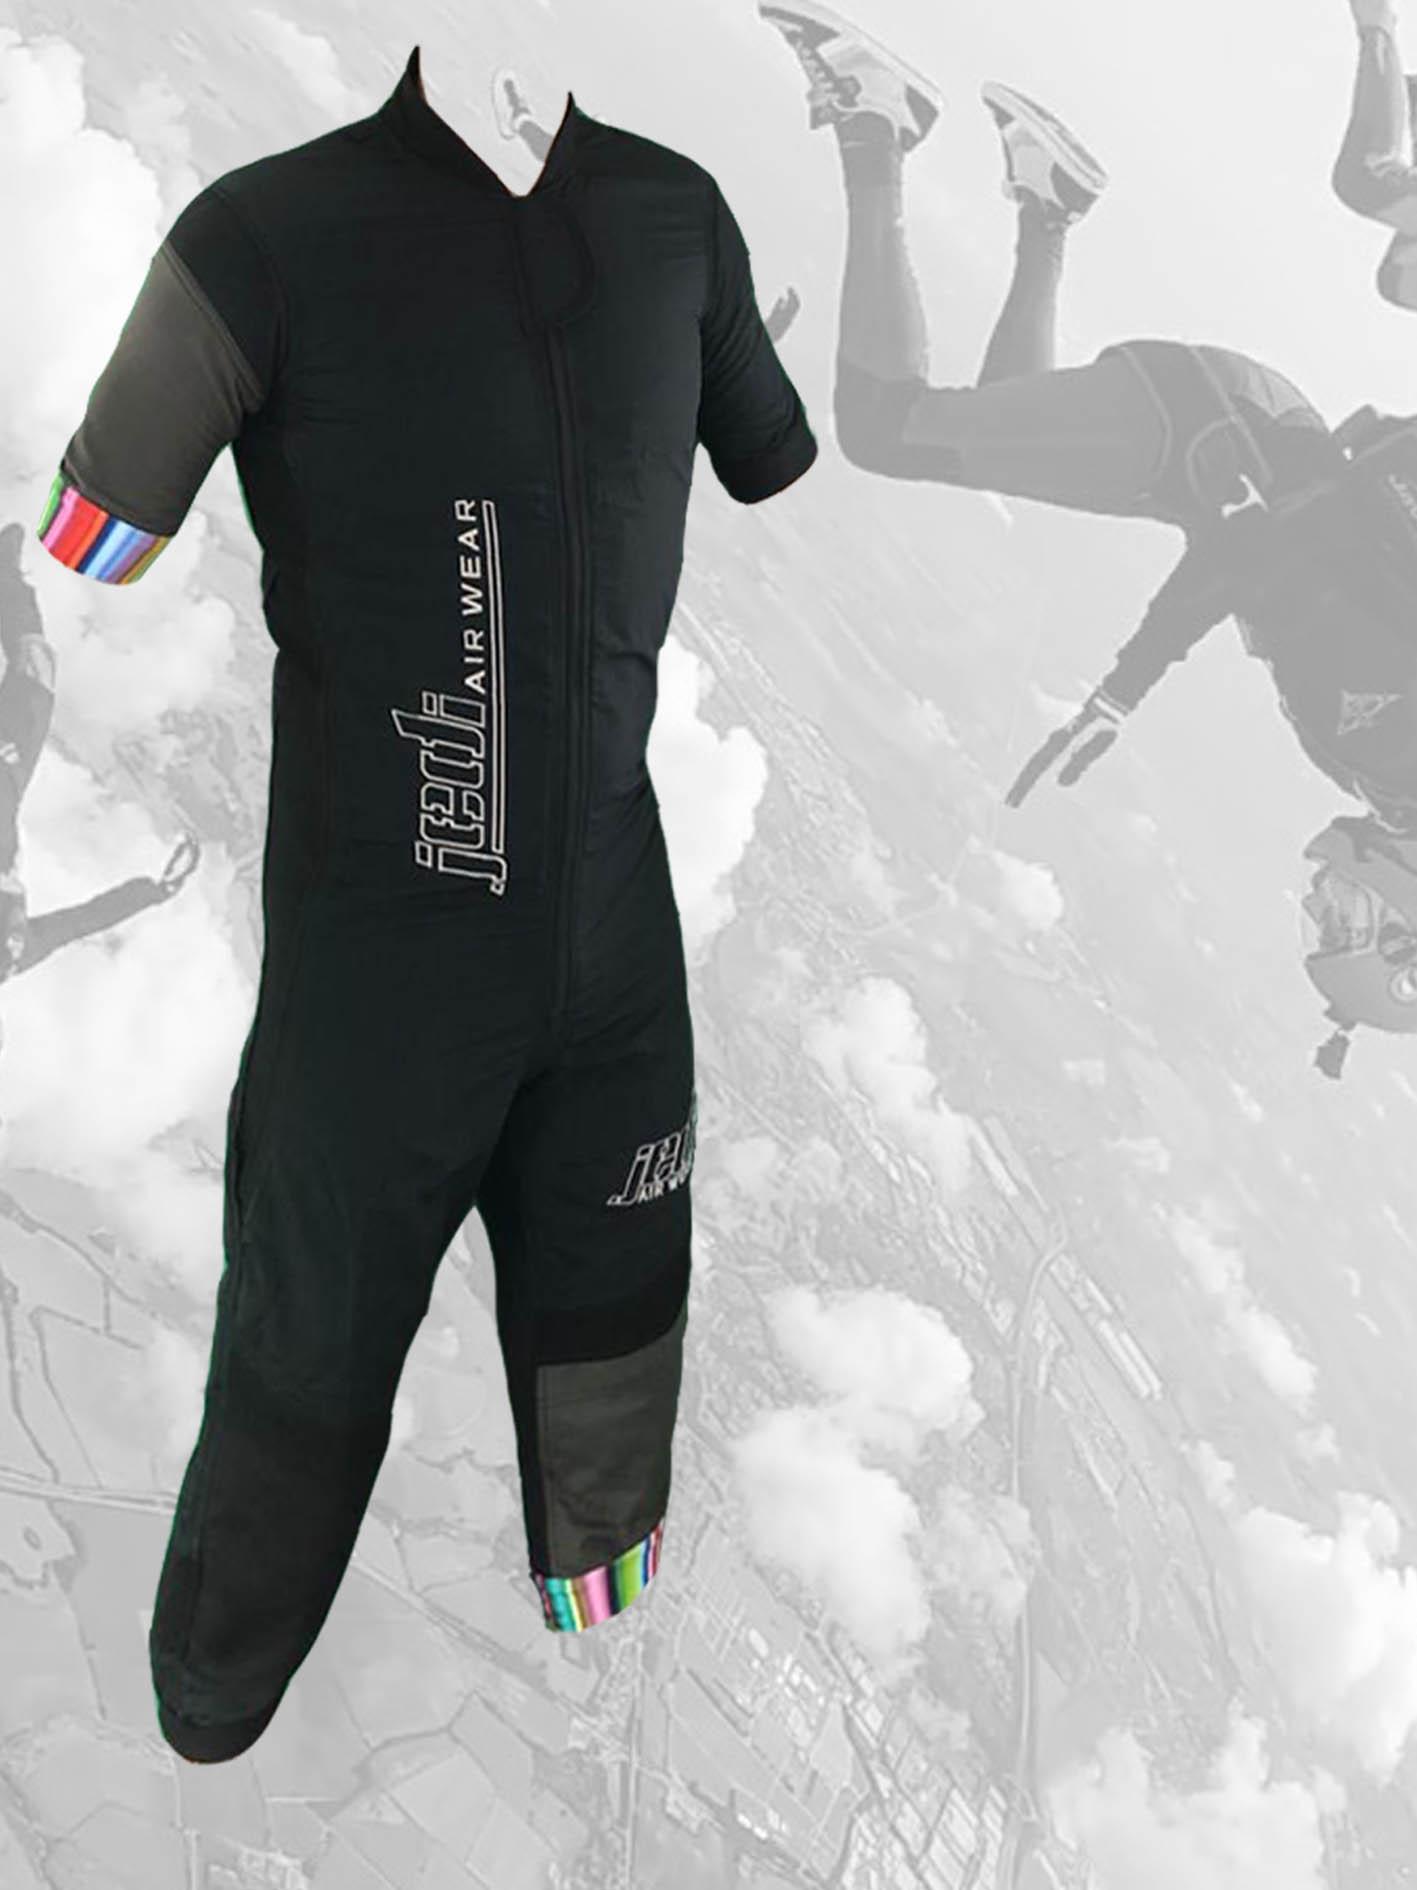 Freefly shorty suit